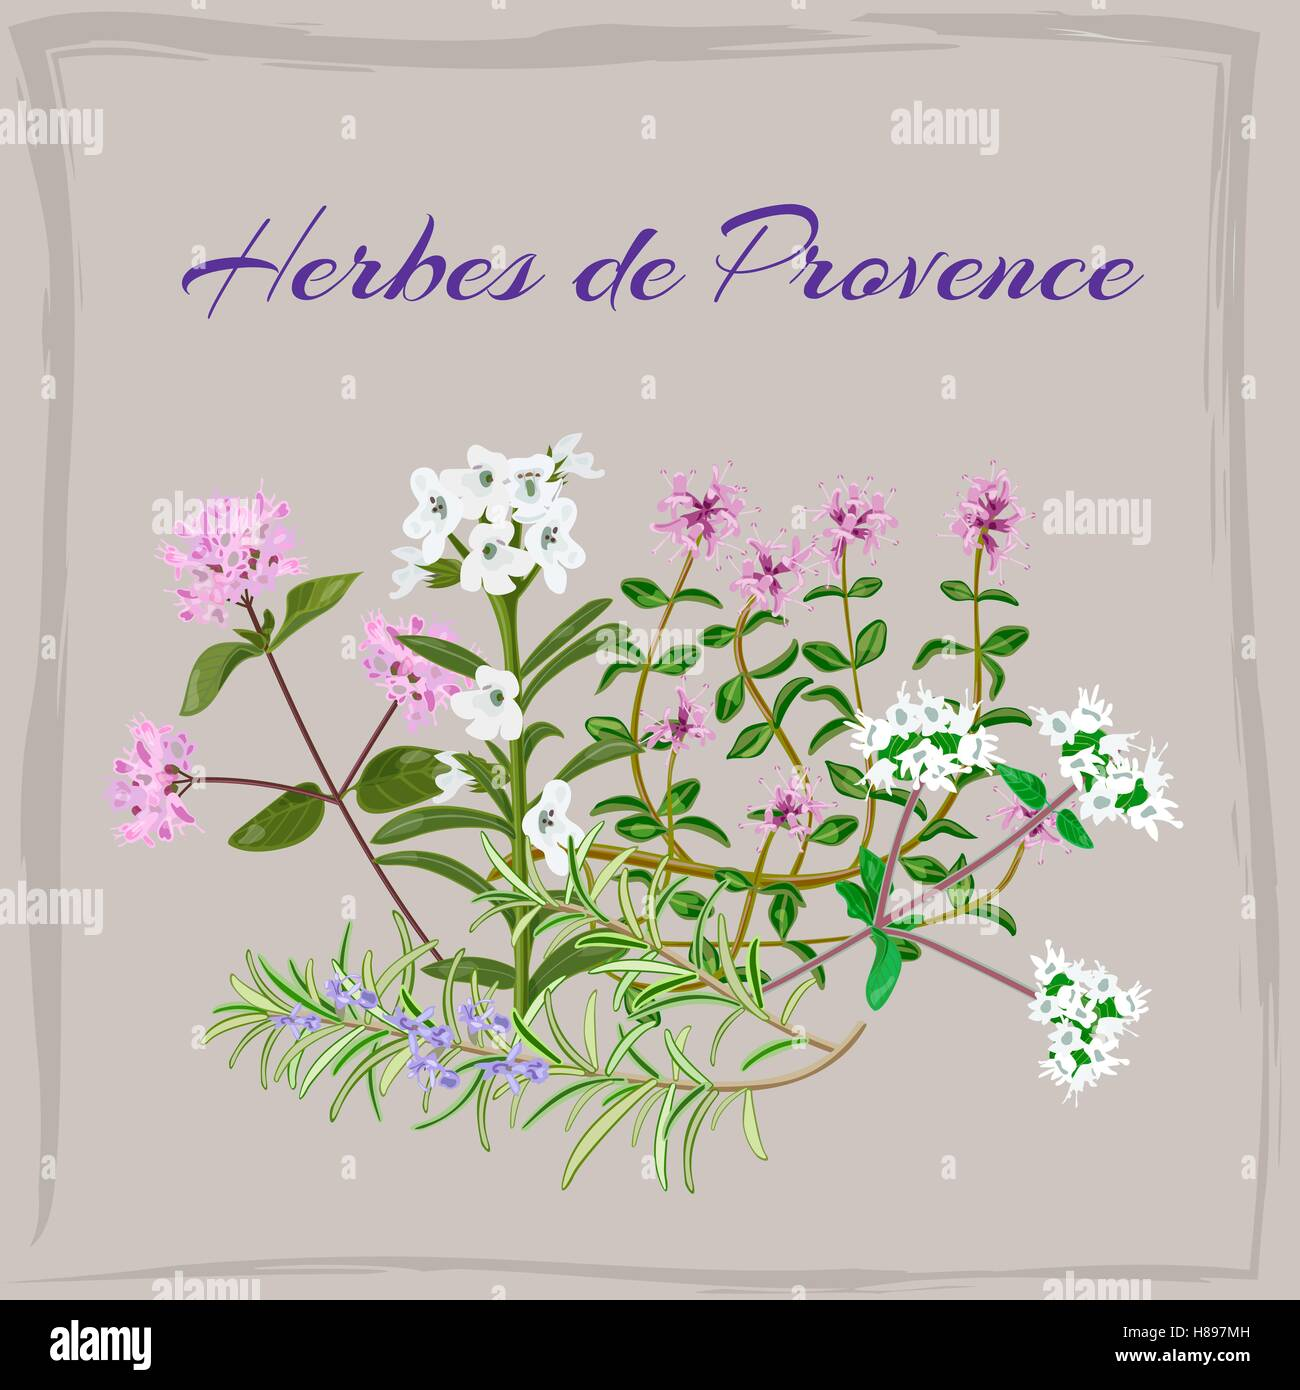 Herbes de Provence. Thyme, Savory, Oregano, Marjoram, Rosemary. Vector illustration. - Stock Vector